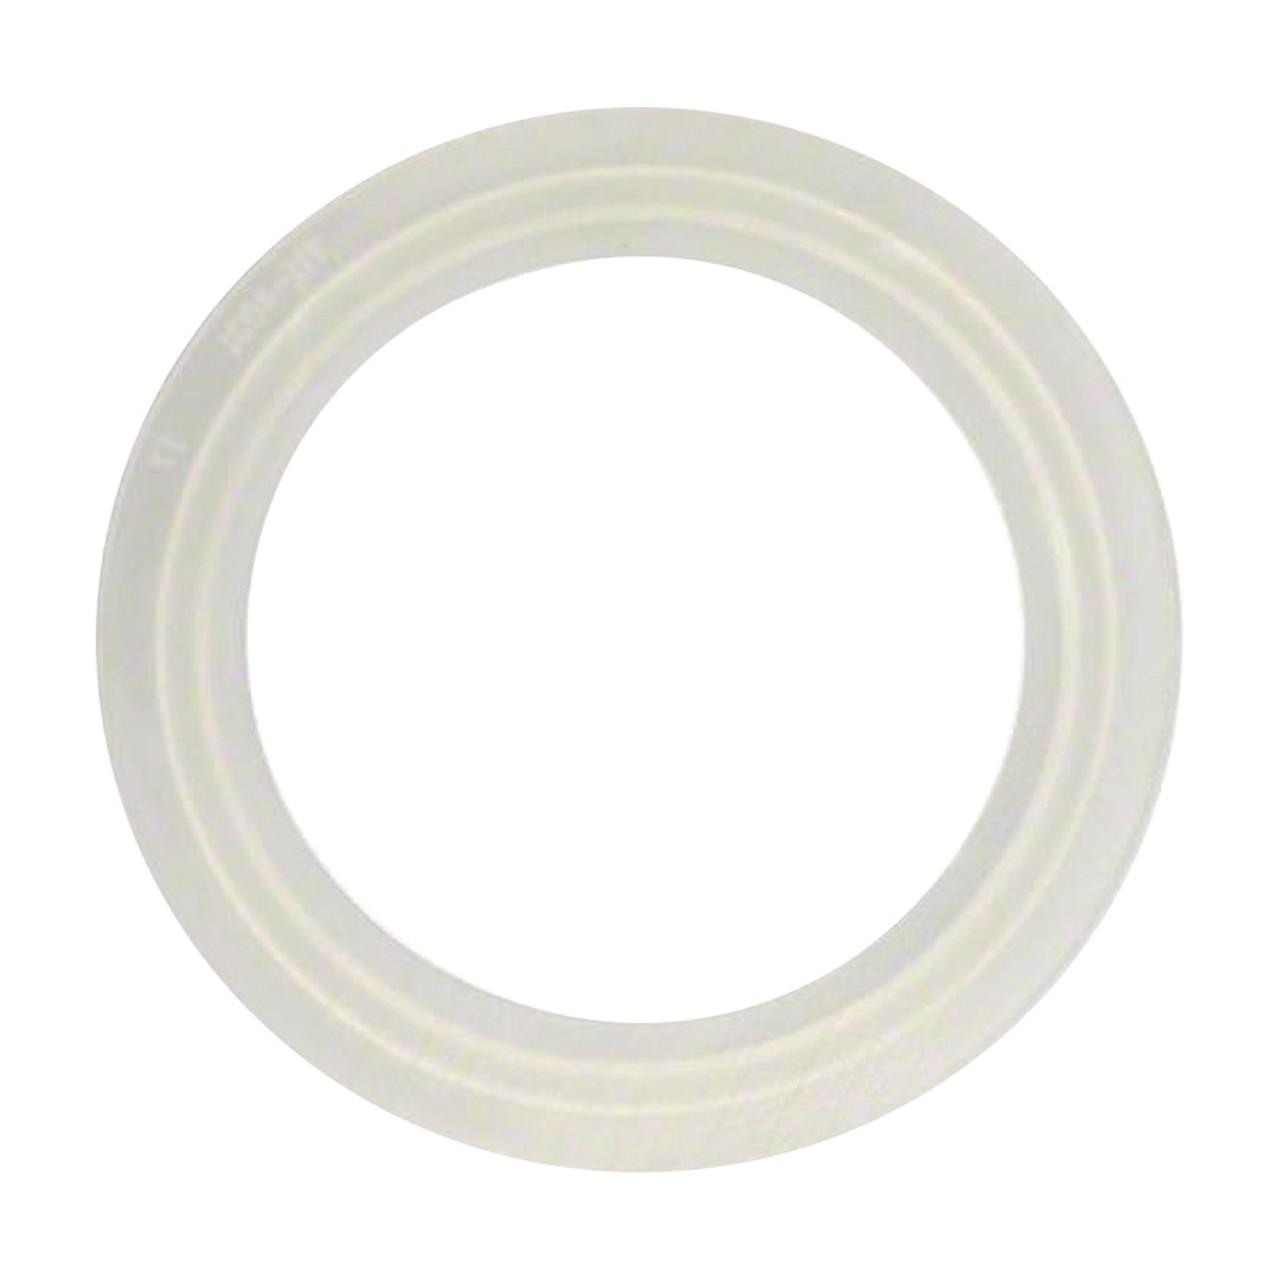 SplitNutSet - X801765 - Master Spa Heater Gasket O-Ring